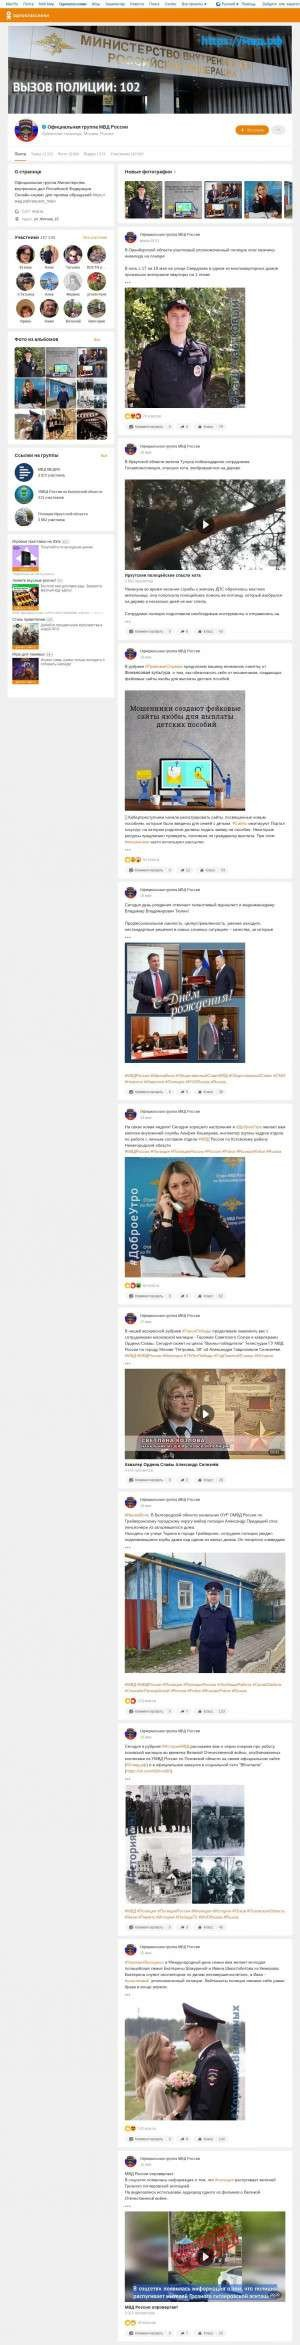 Предпросмотр для www.odnoklassniki.ru — Информационный центр МВД по Республике Коми